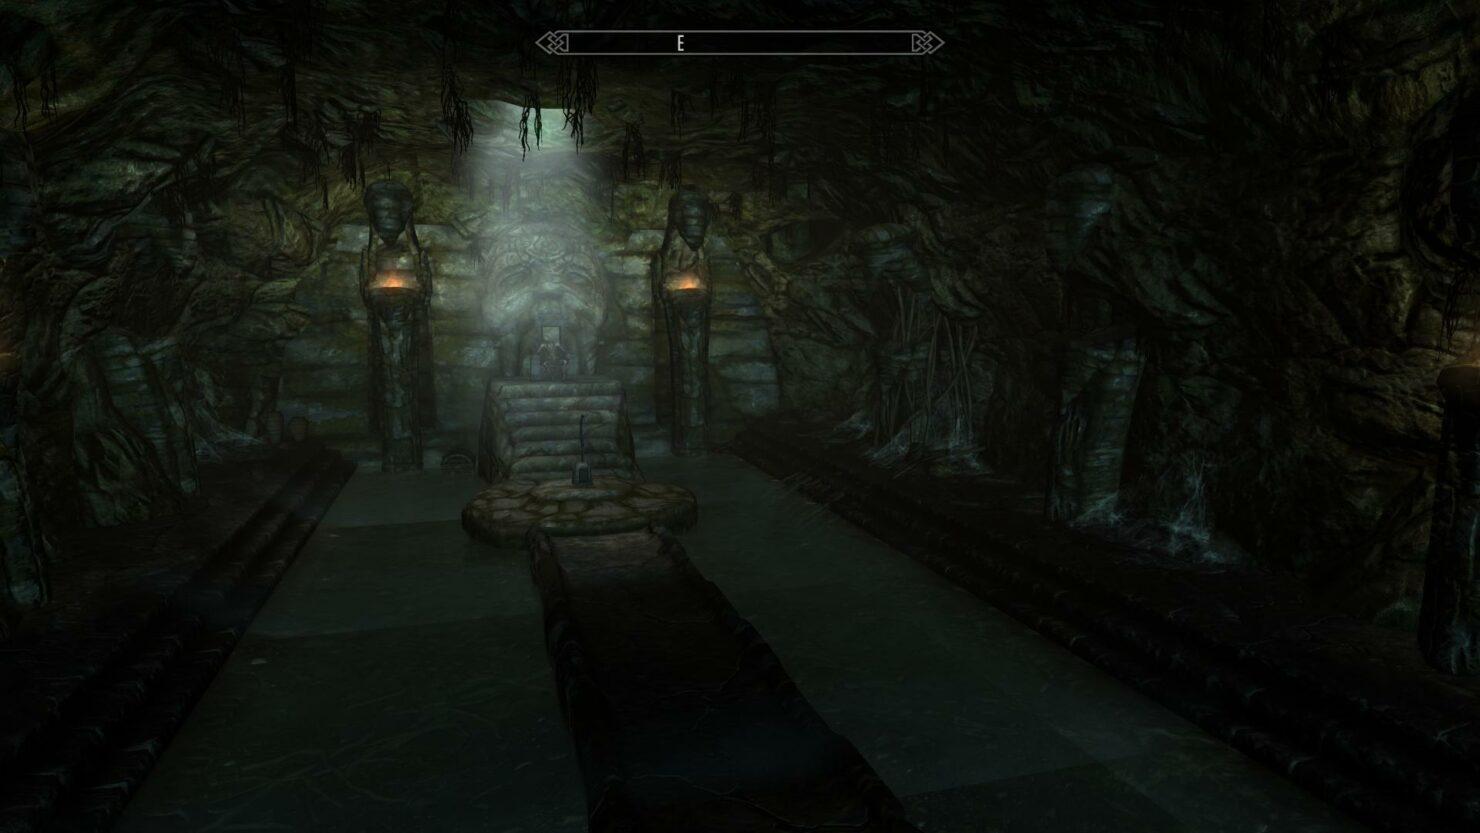 witcher-3-inspired-skyrim-fan-expansion-land-of-vominheim-7